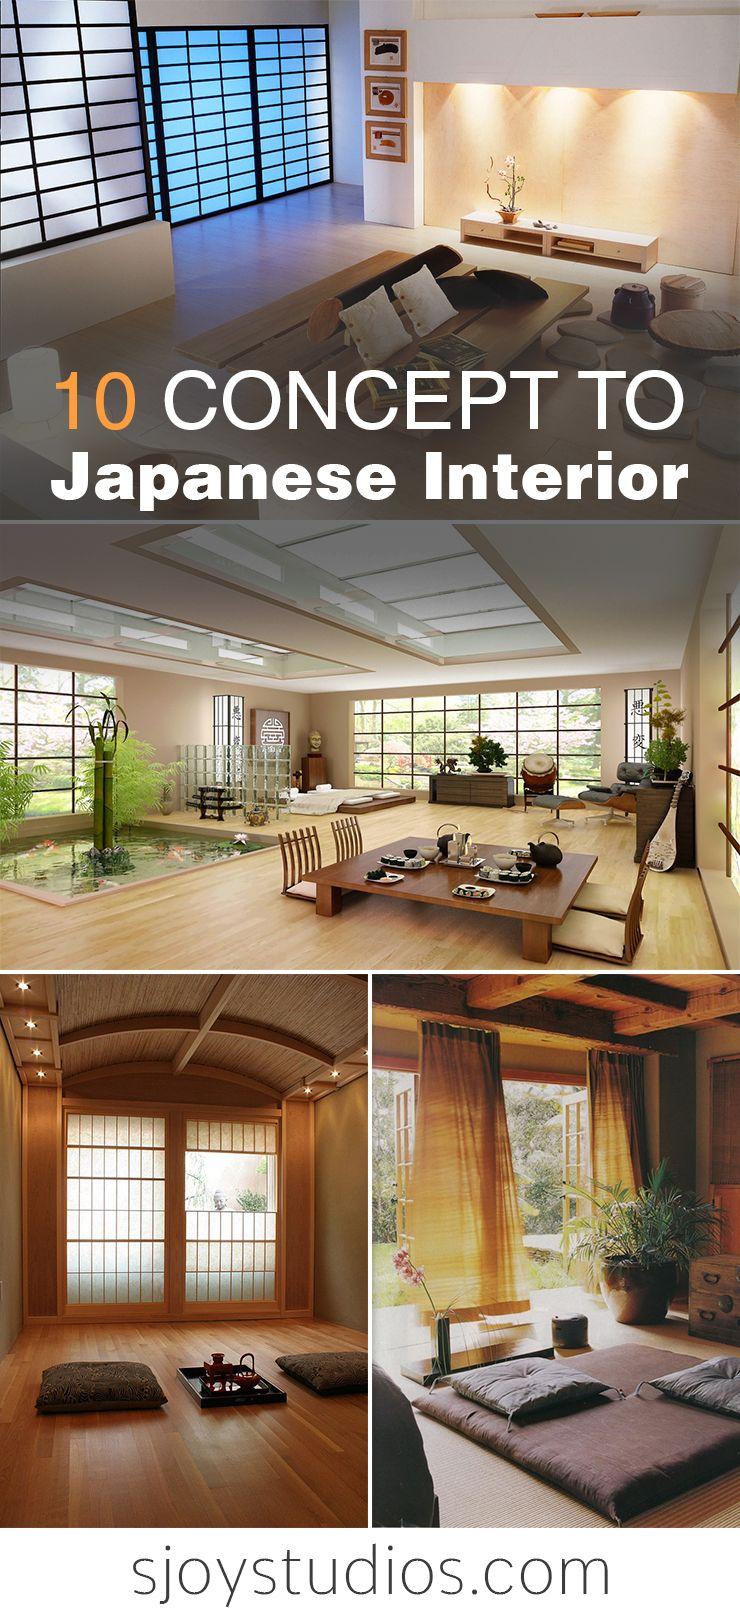 Japanese interior concept interior concept home interior design japanese interior interior designing